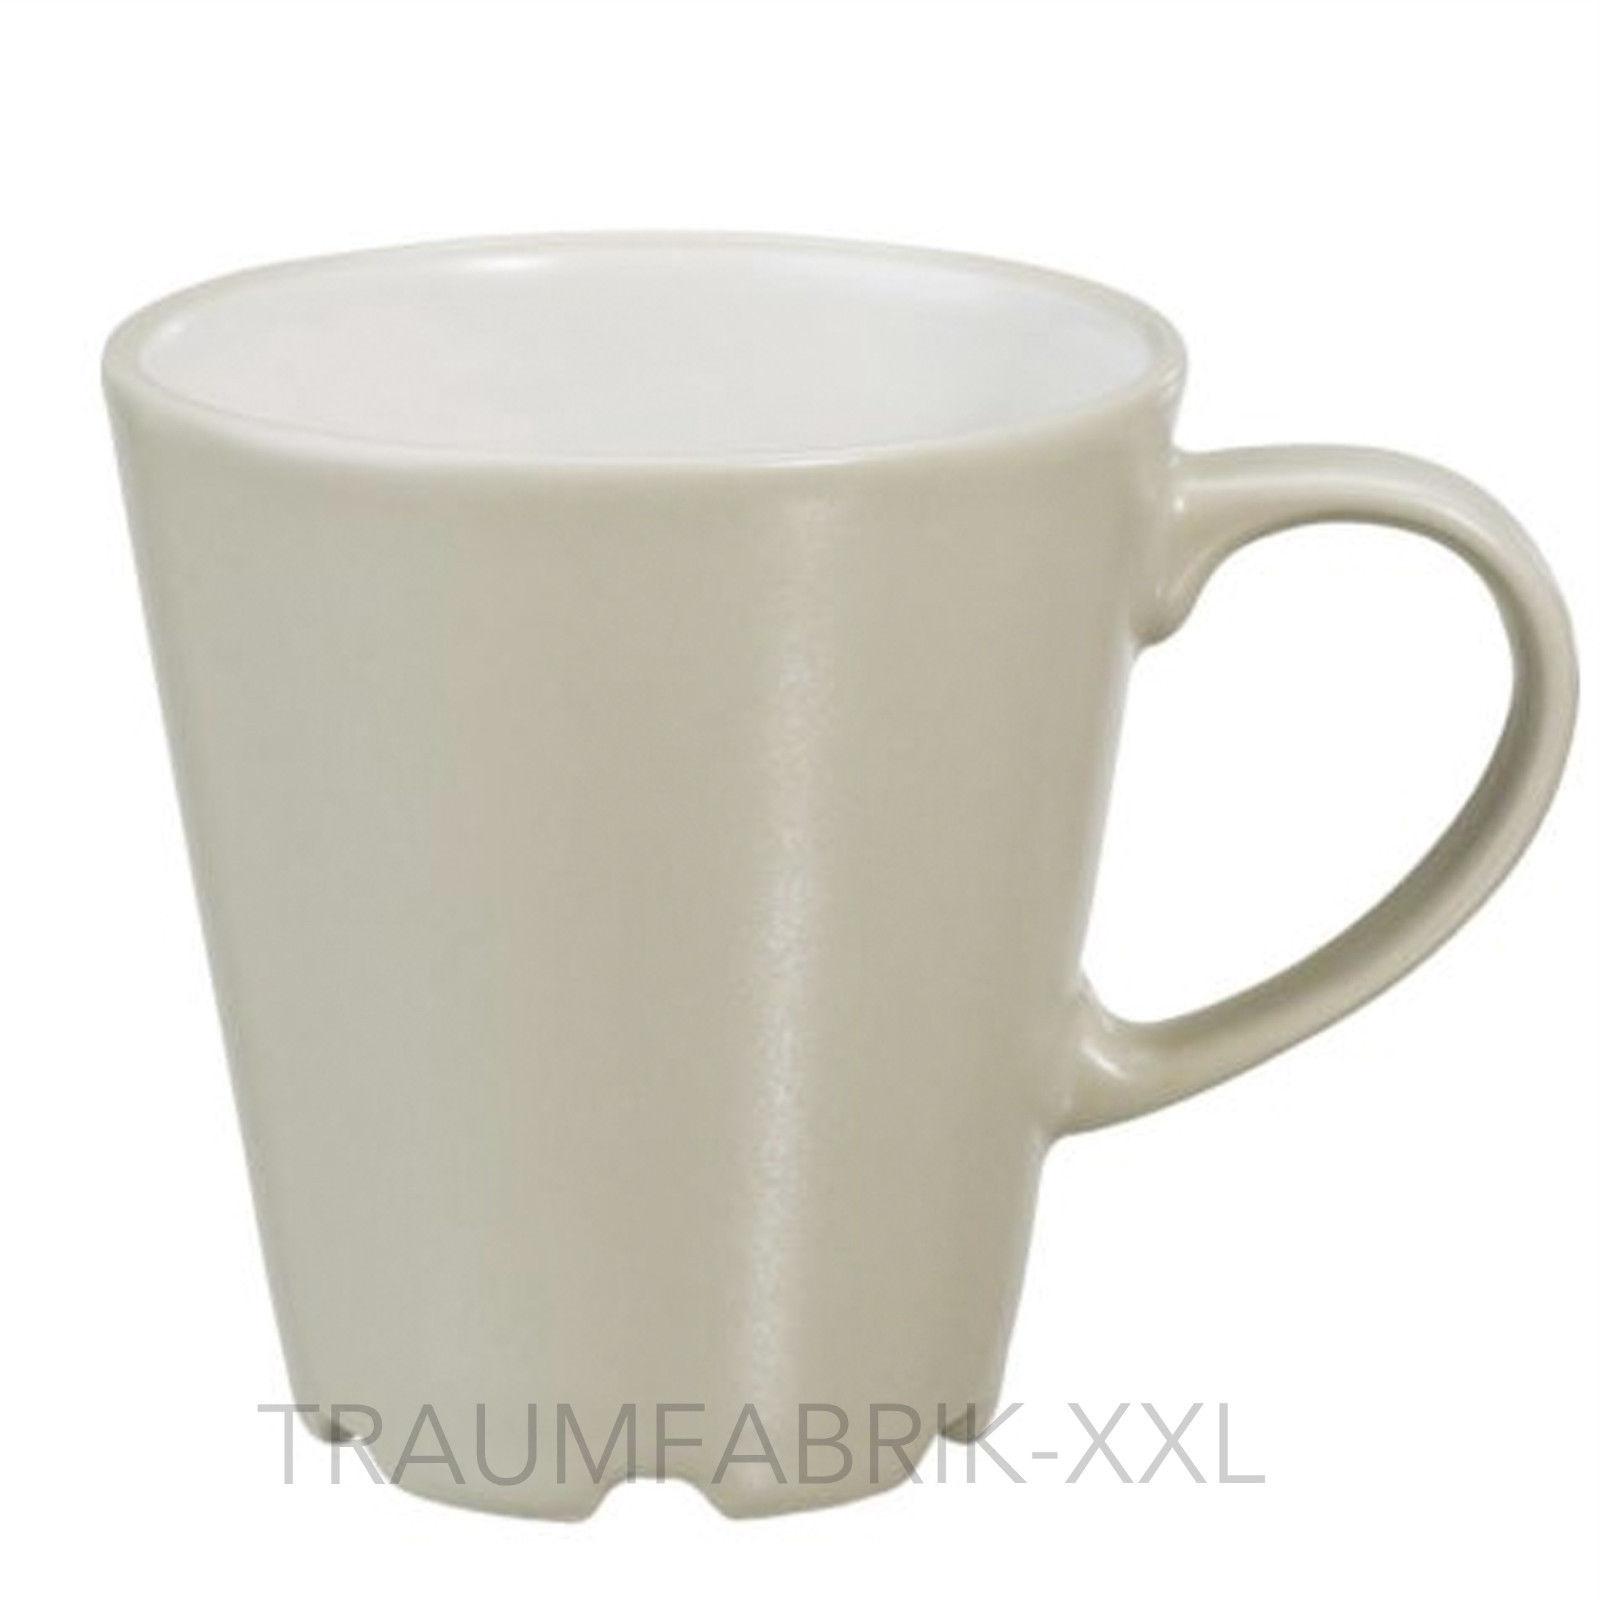 ikea dinera kaffeebecher beige kaffee tasse becher. Black Bedroom Furniture Sets. Home Design Ideas